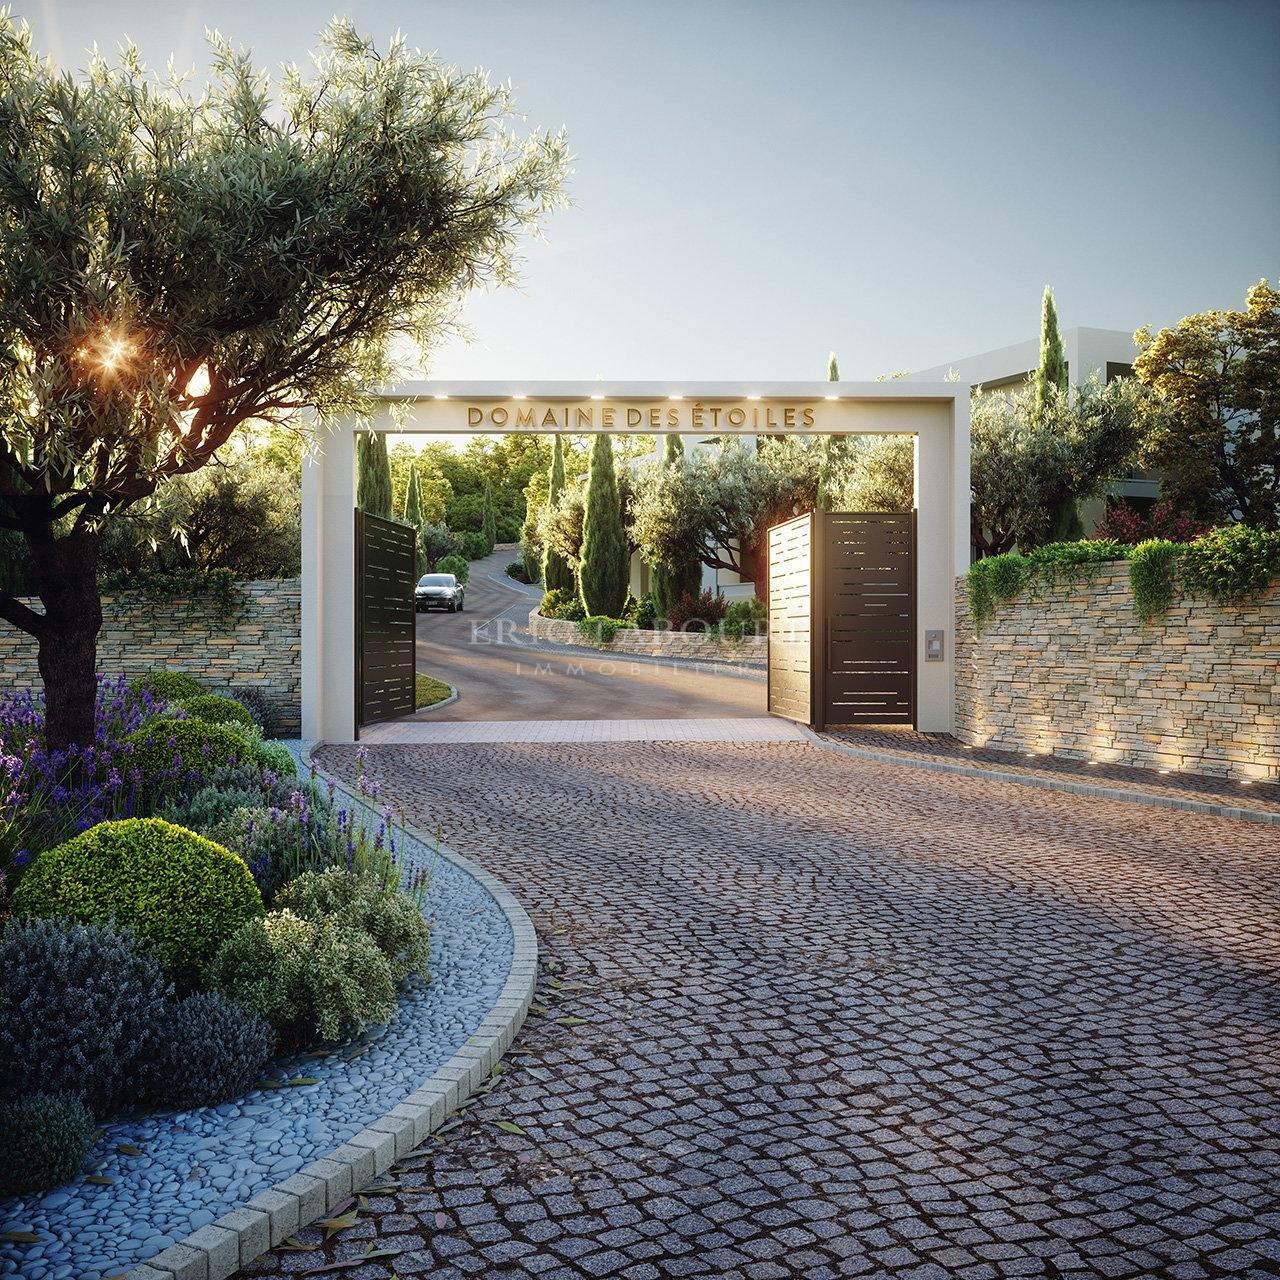 Mougins Residence Constellation - Vente Appartement NEUF Rez de jaridn 4p + 170m2 de jardin privatif